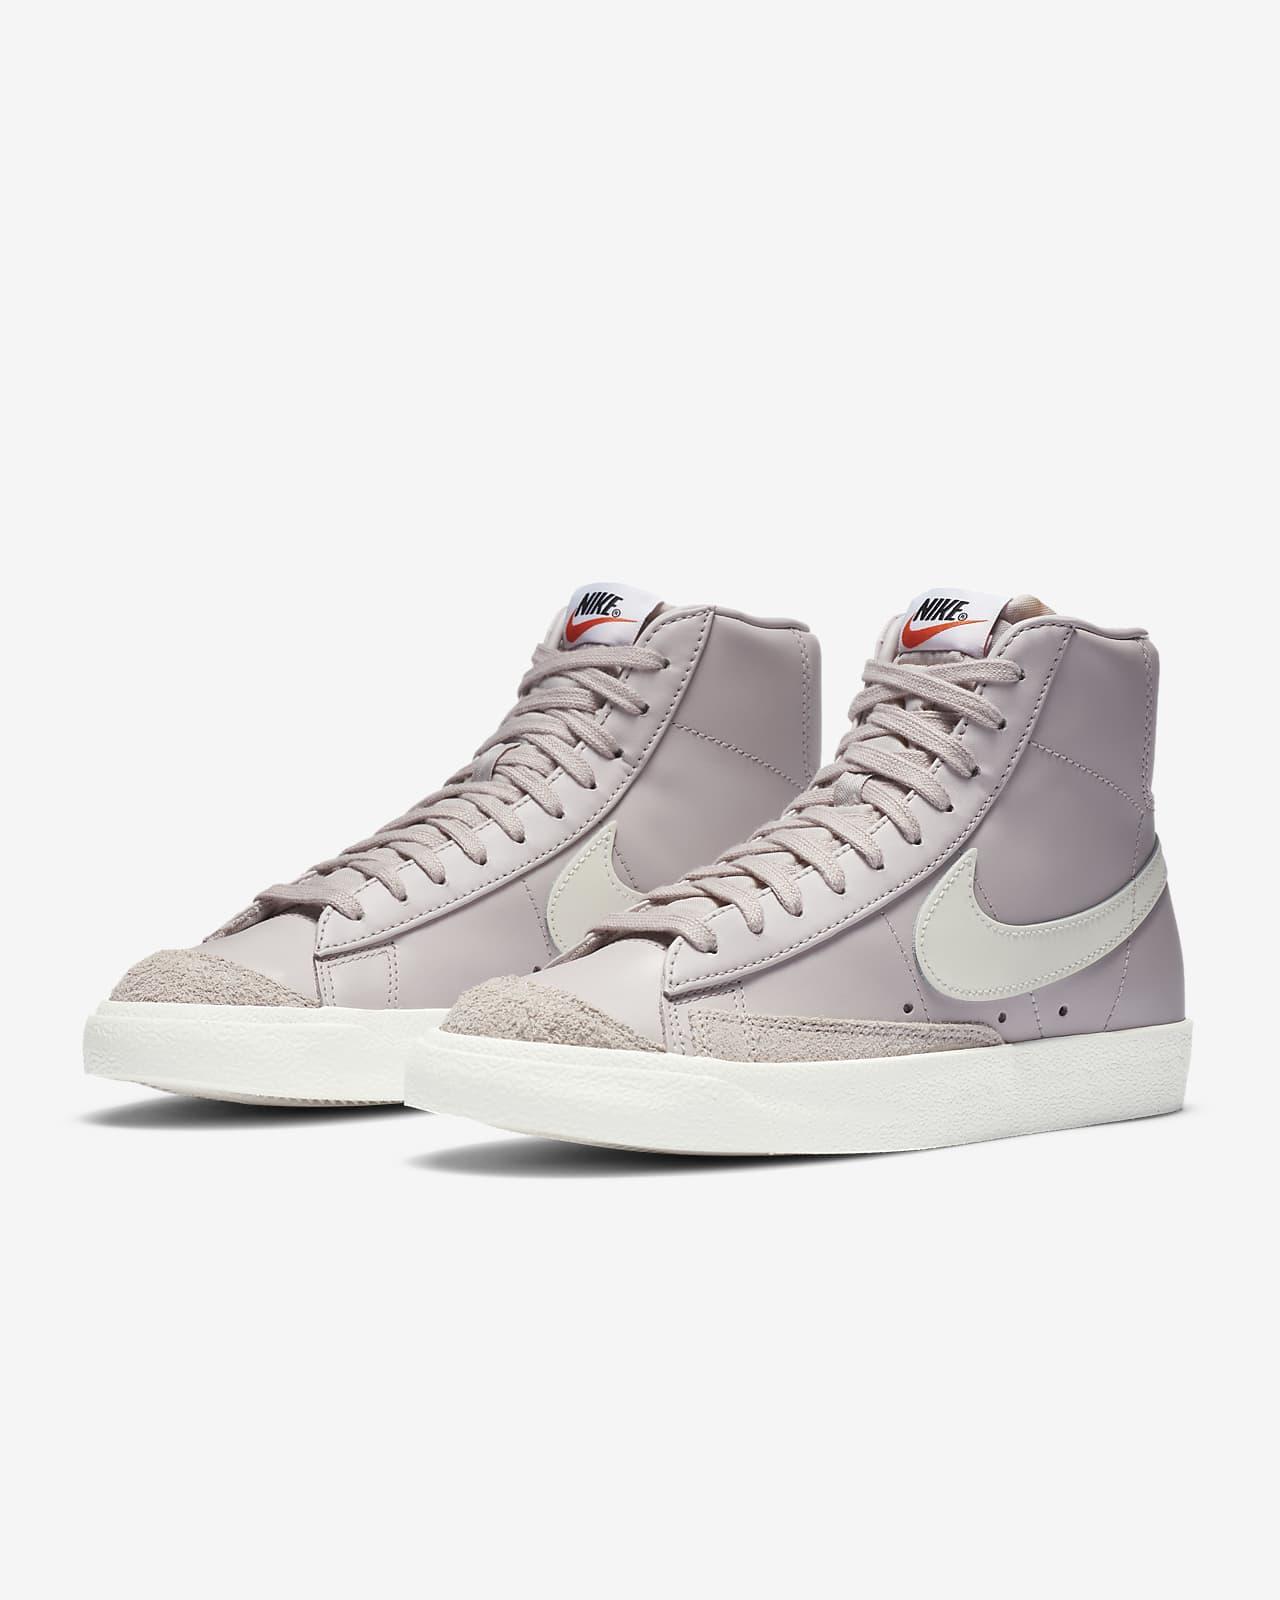 Lavandería a monedas Sentimiento de culpa pavimento  Nike Blazer Mid '77 Vintage Women's Shoe. Nike.com